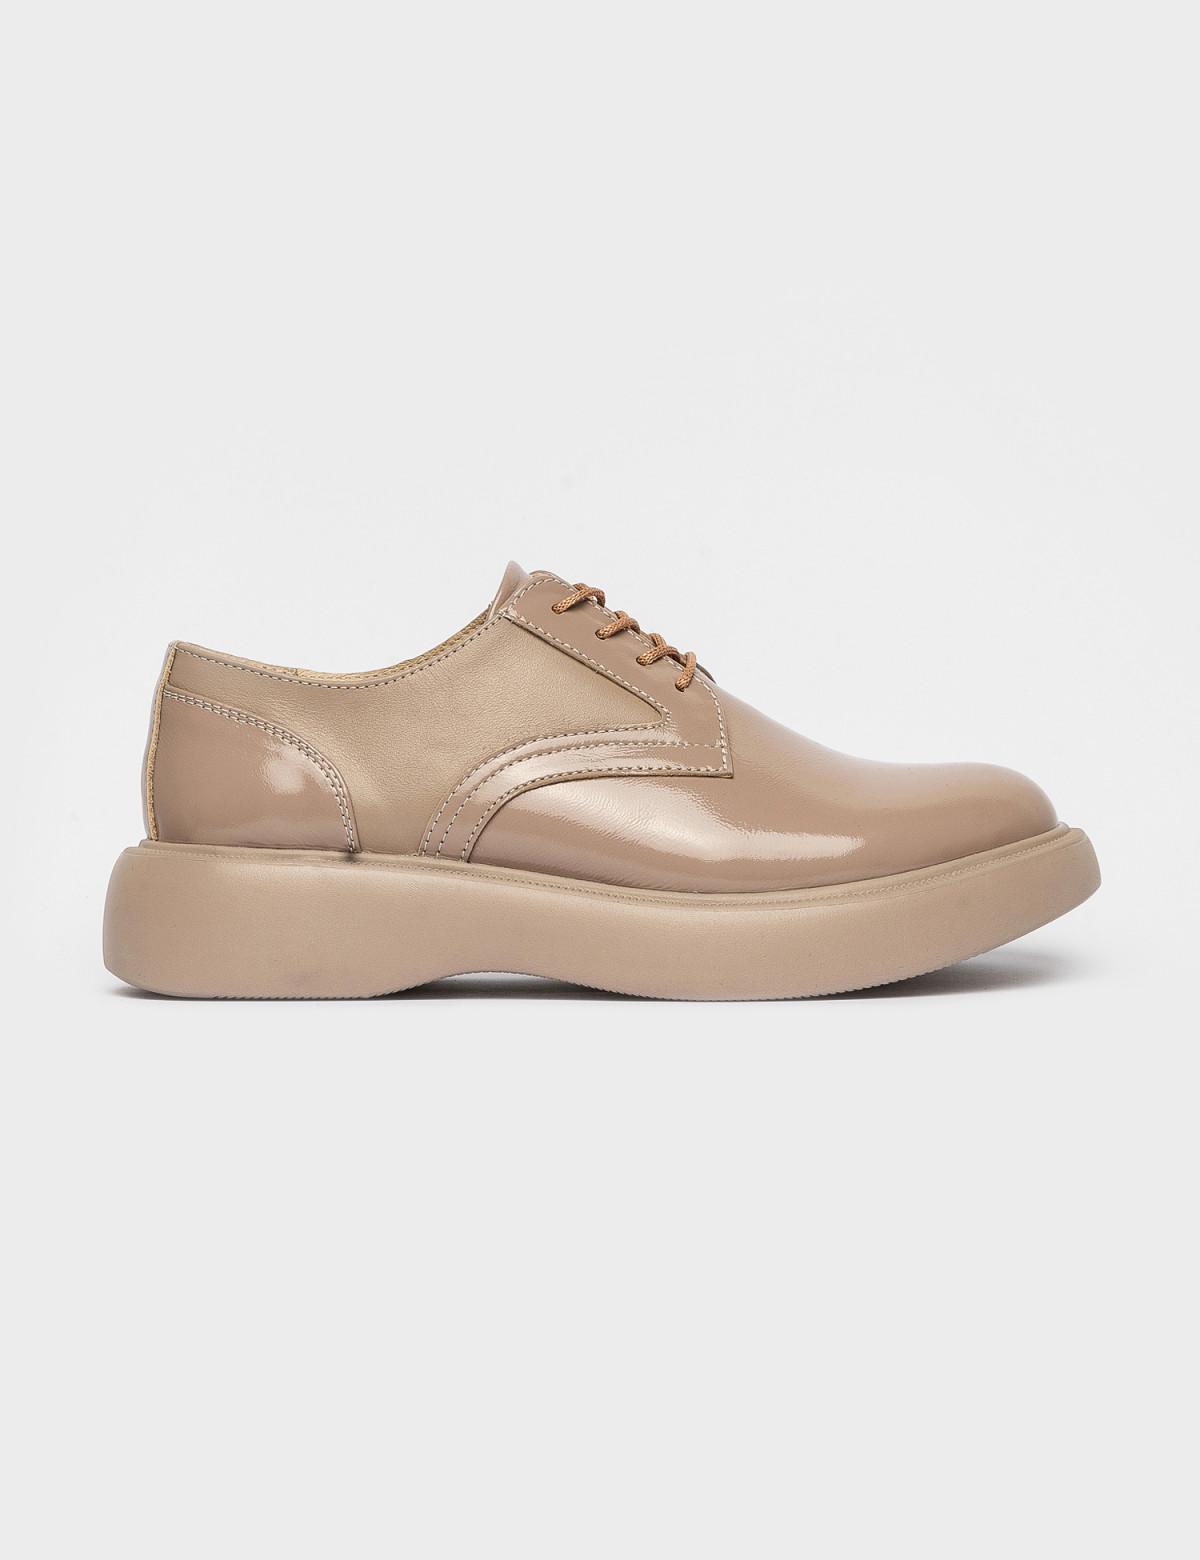 Туфлі бежеві. Натуральна шкіра